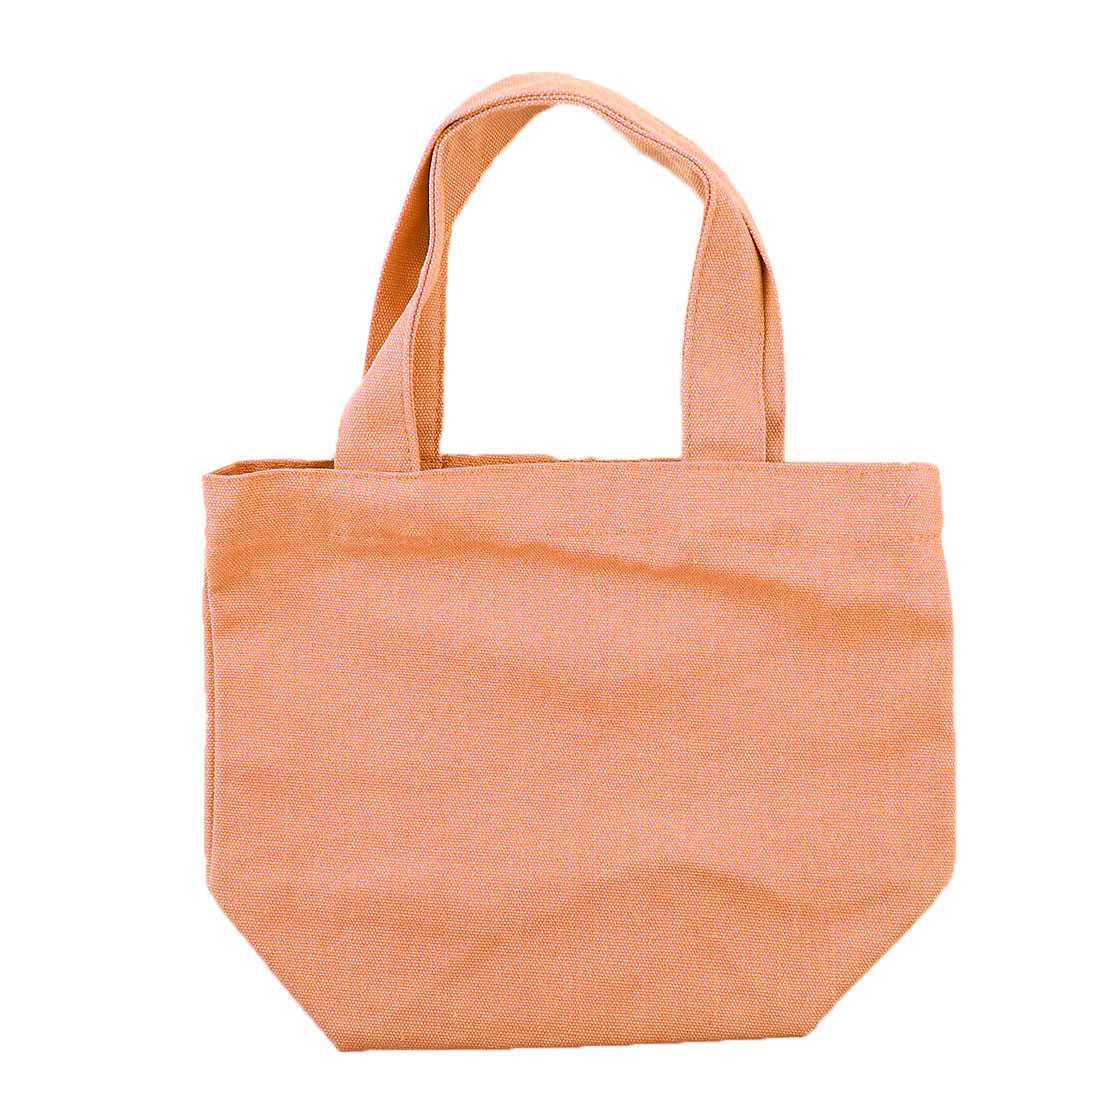 Office Cosmetic Lunch Box Holder Storage Handbag Canvas Tote Bag Orange